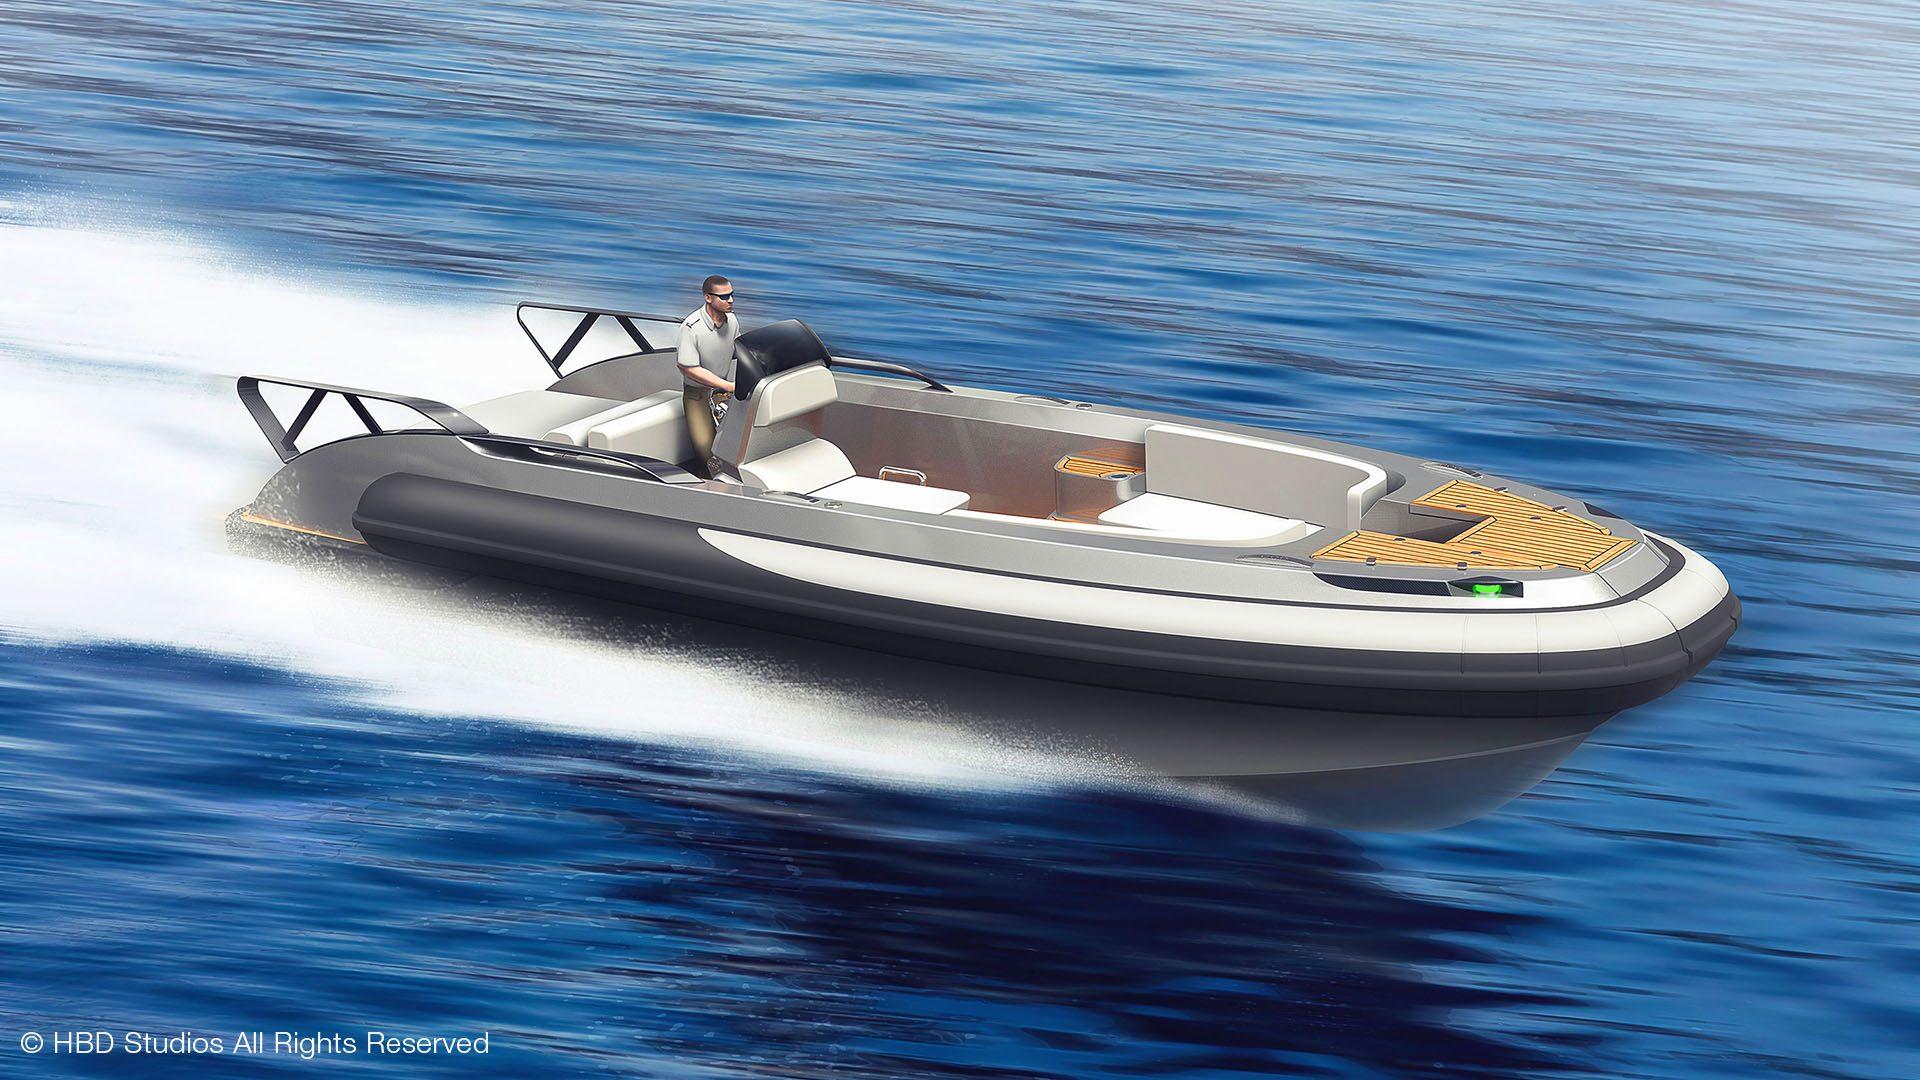 CC LINE superyacht tender boat RIB tender design by Hamid Bekradi, HBD Studios